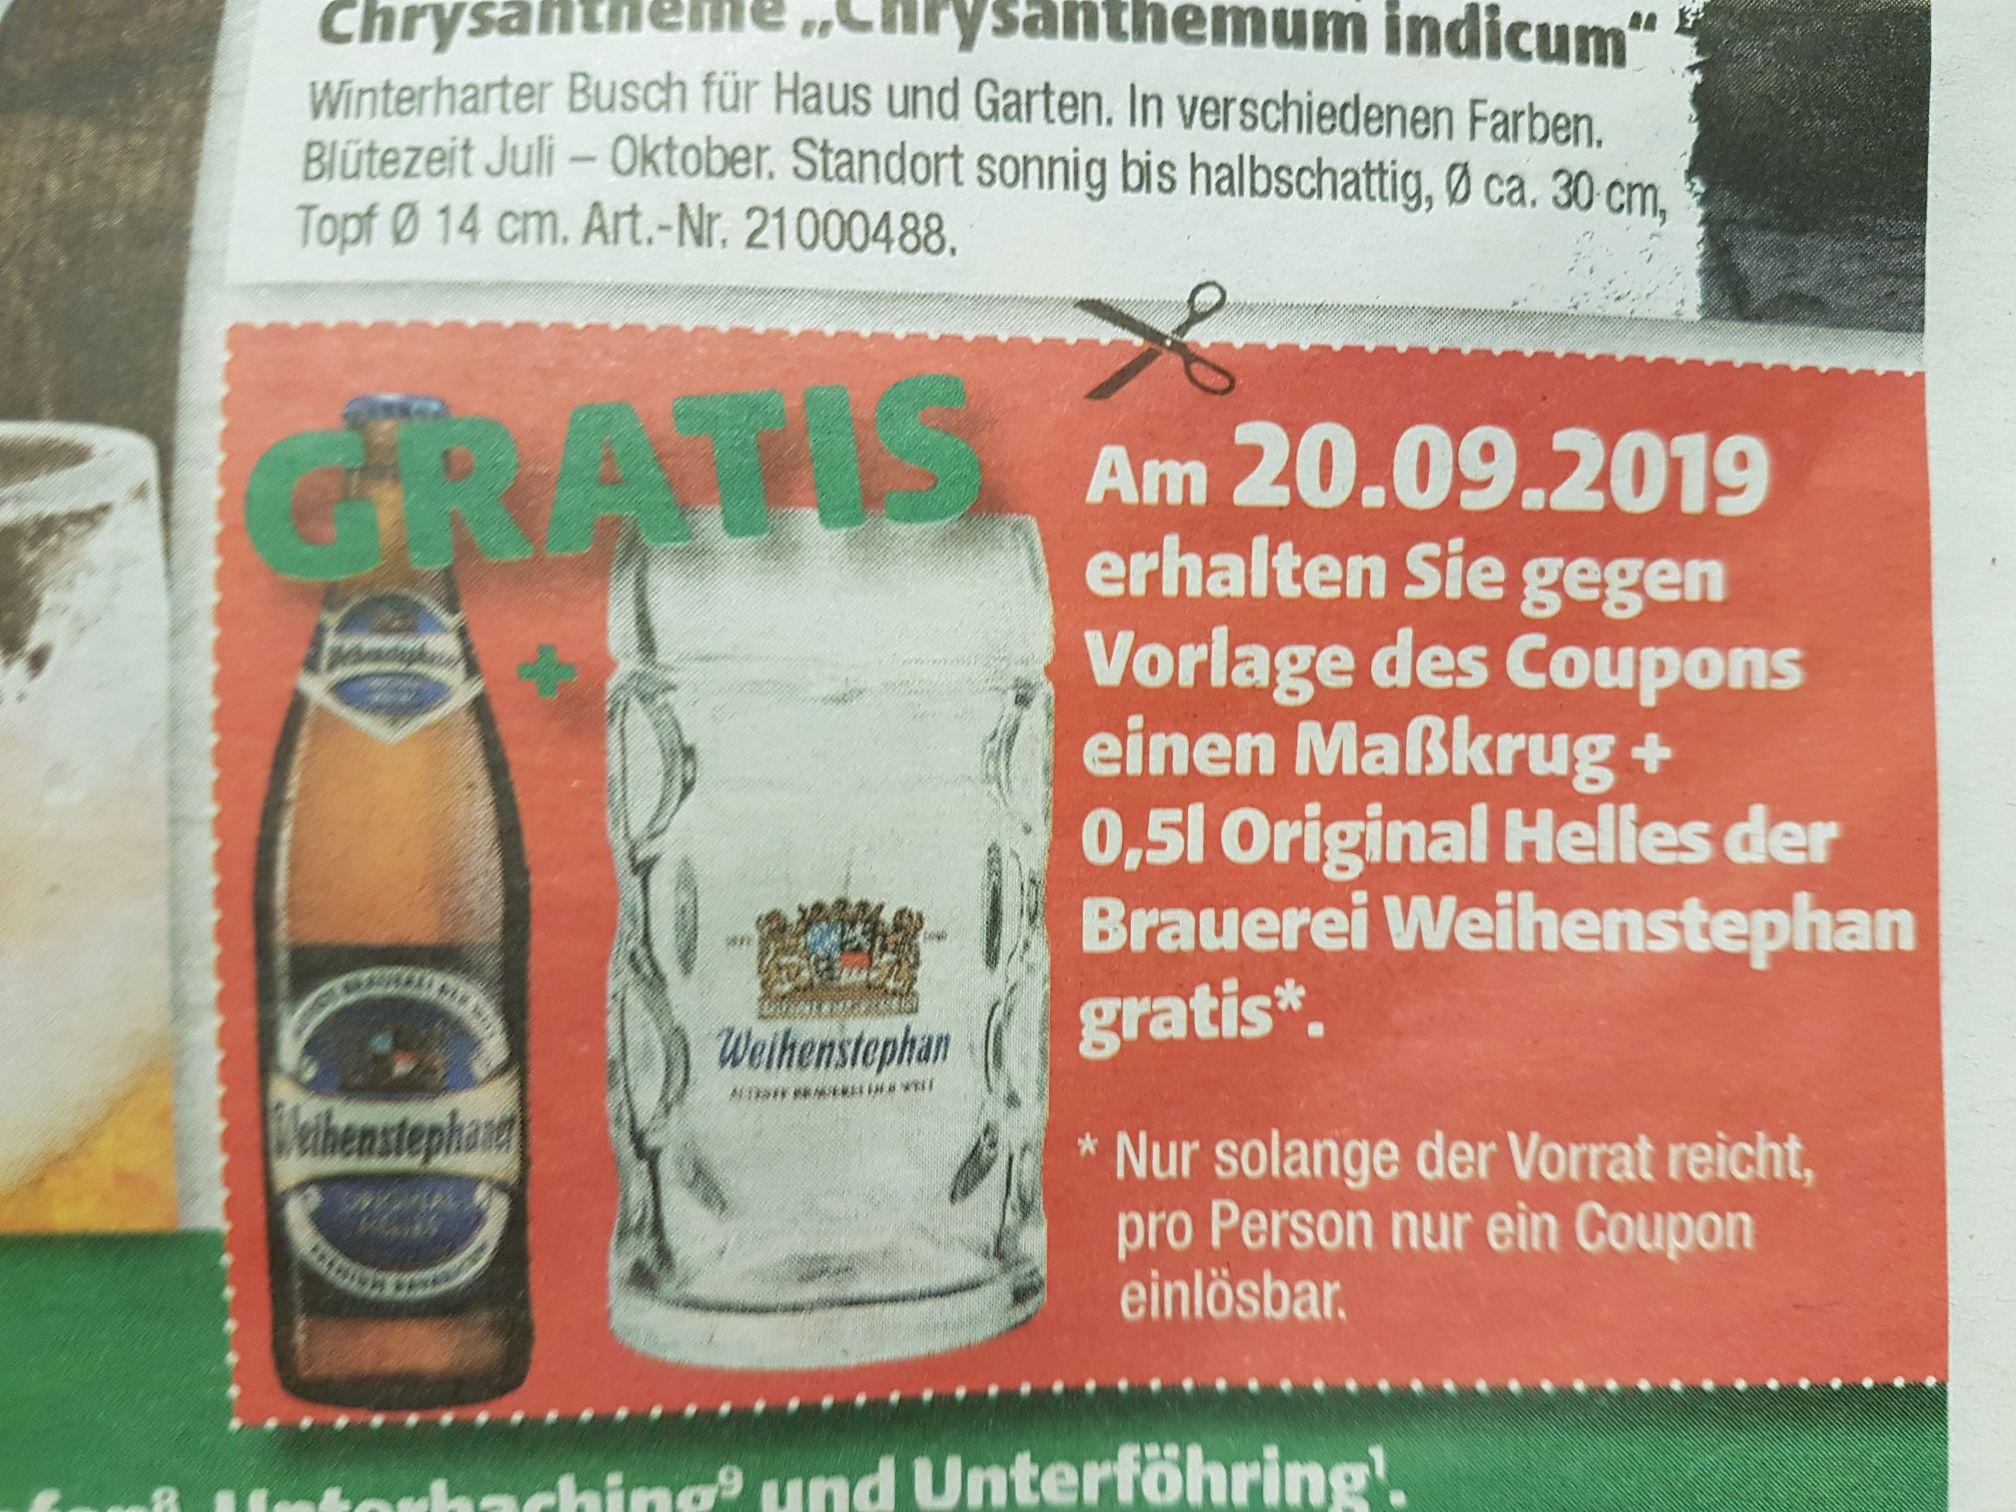 LOKAL München - Bei Hagebaumarkt gratis Maßkrug + Bier